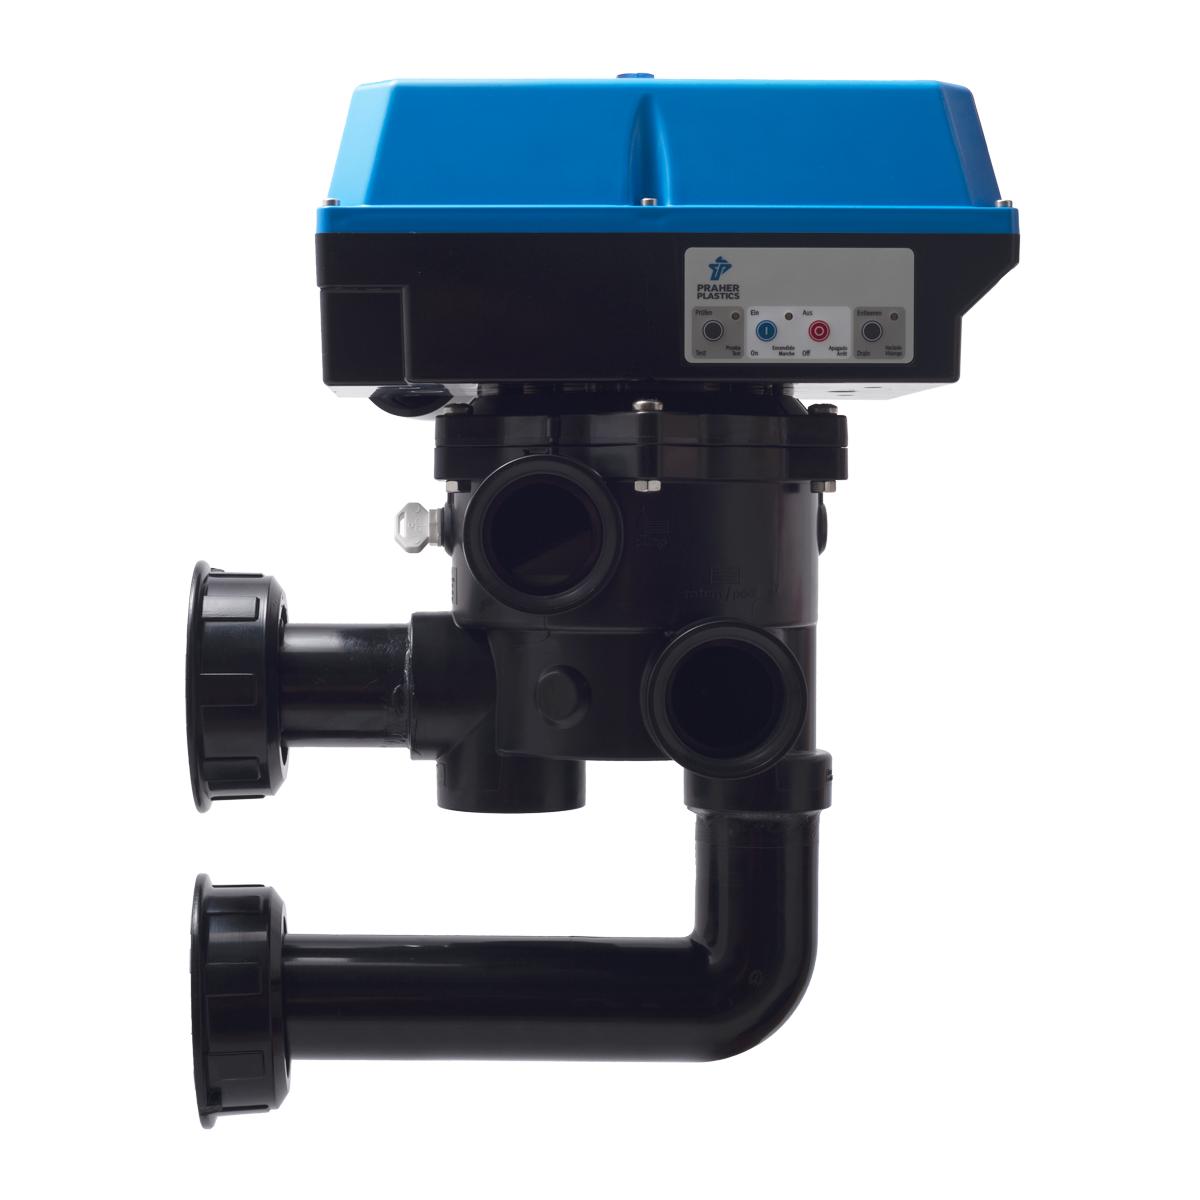 "AquaStar EasyII with pressure sensor SM10 3 1½"" ABS white thread BSP, withAstral/IML/Certikin/Espa valve set, distance 125mm, MOP 3,5 bar NBR tpe AquaStar EasyII with pressure sensor SM10 3 1½"" ABS white thread BSP, withAstral/IML/Certikin/Espa valve set, distance 125mm, MOP 3,5 bar NBR tpe"